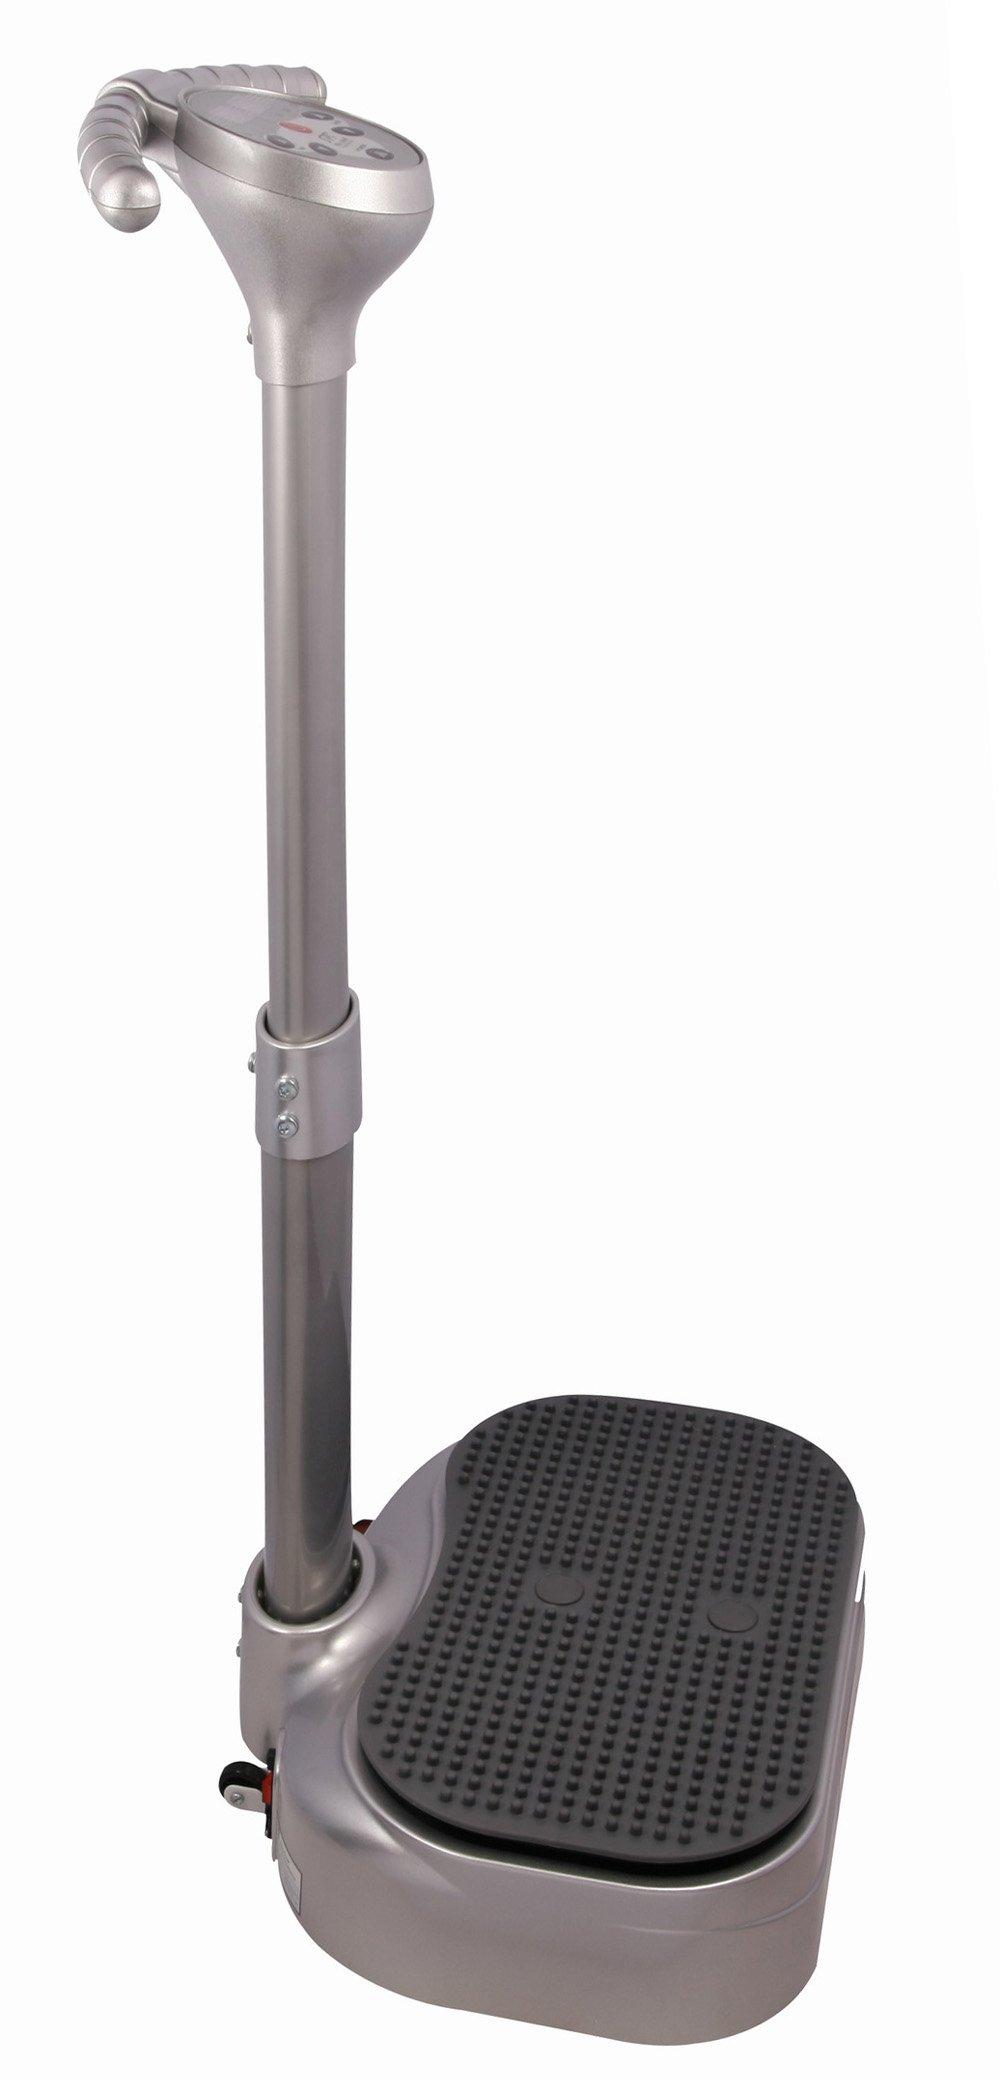 Sunpentown AB-759 Vibratone Whole Body Vibration Machine